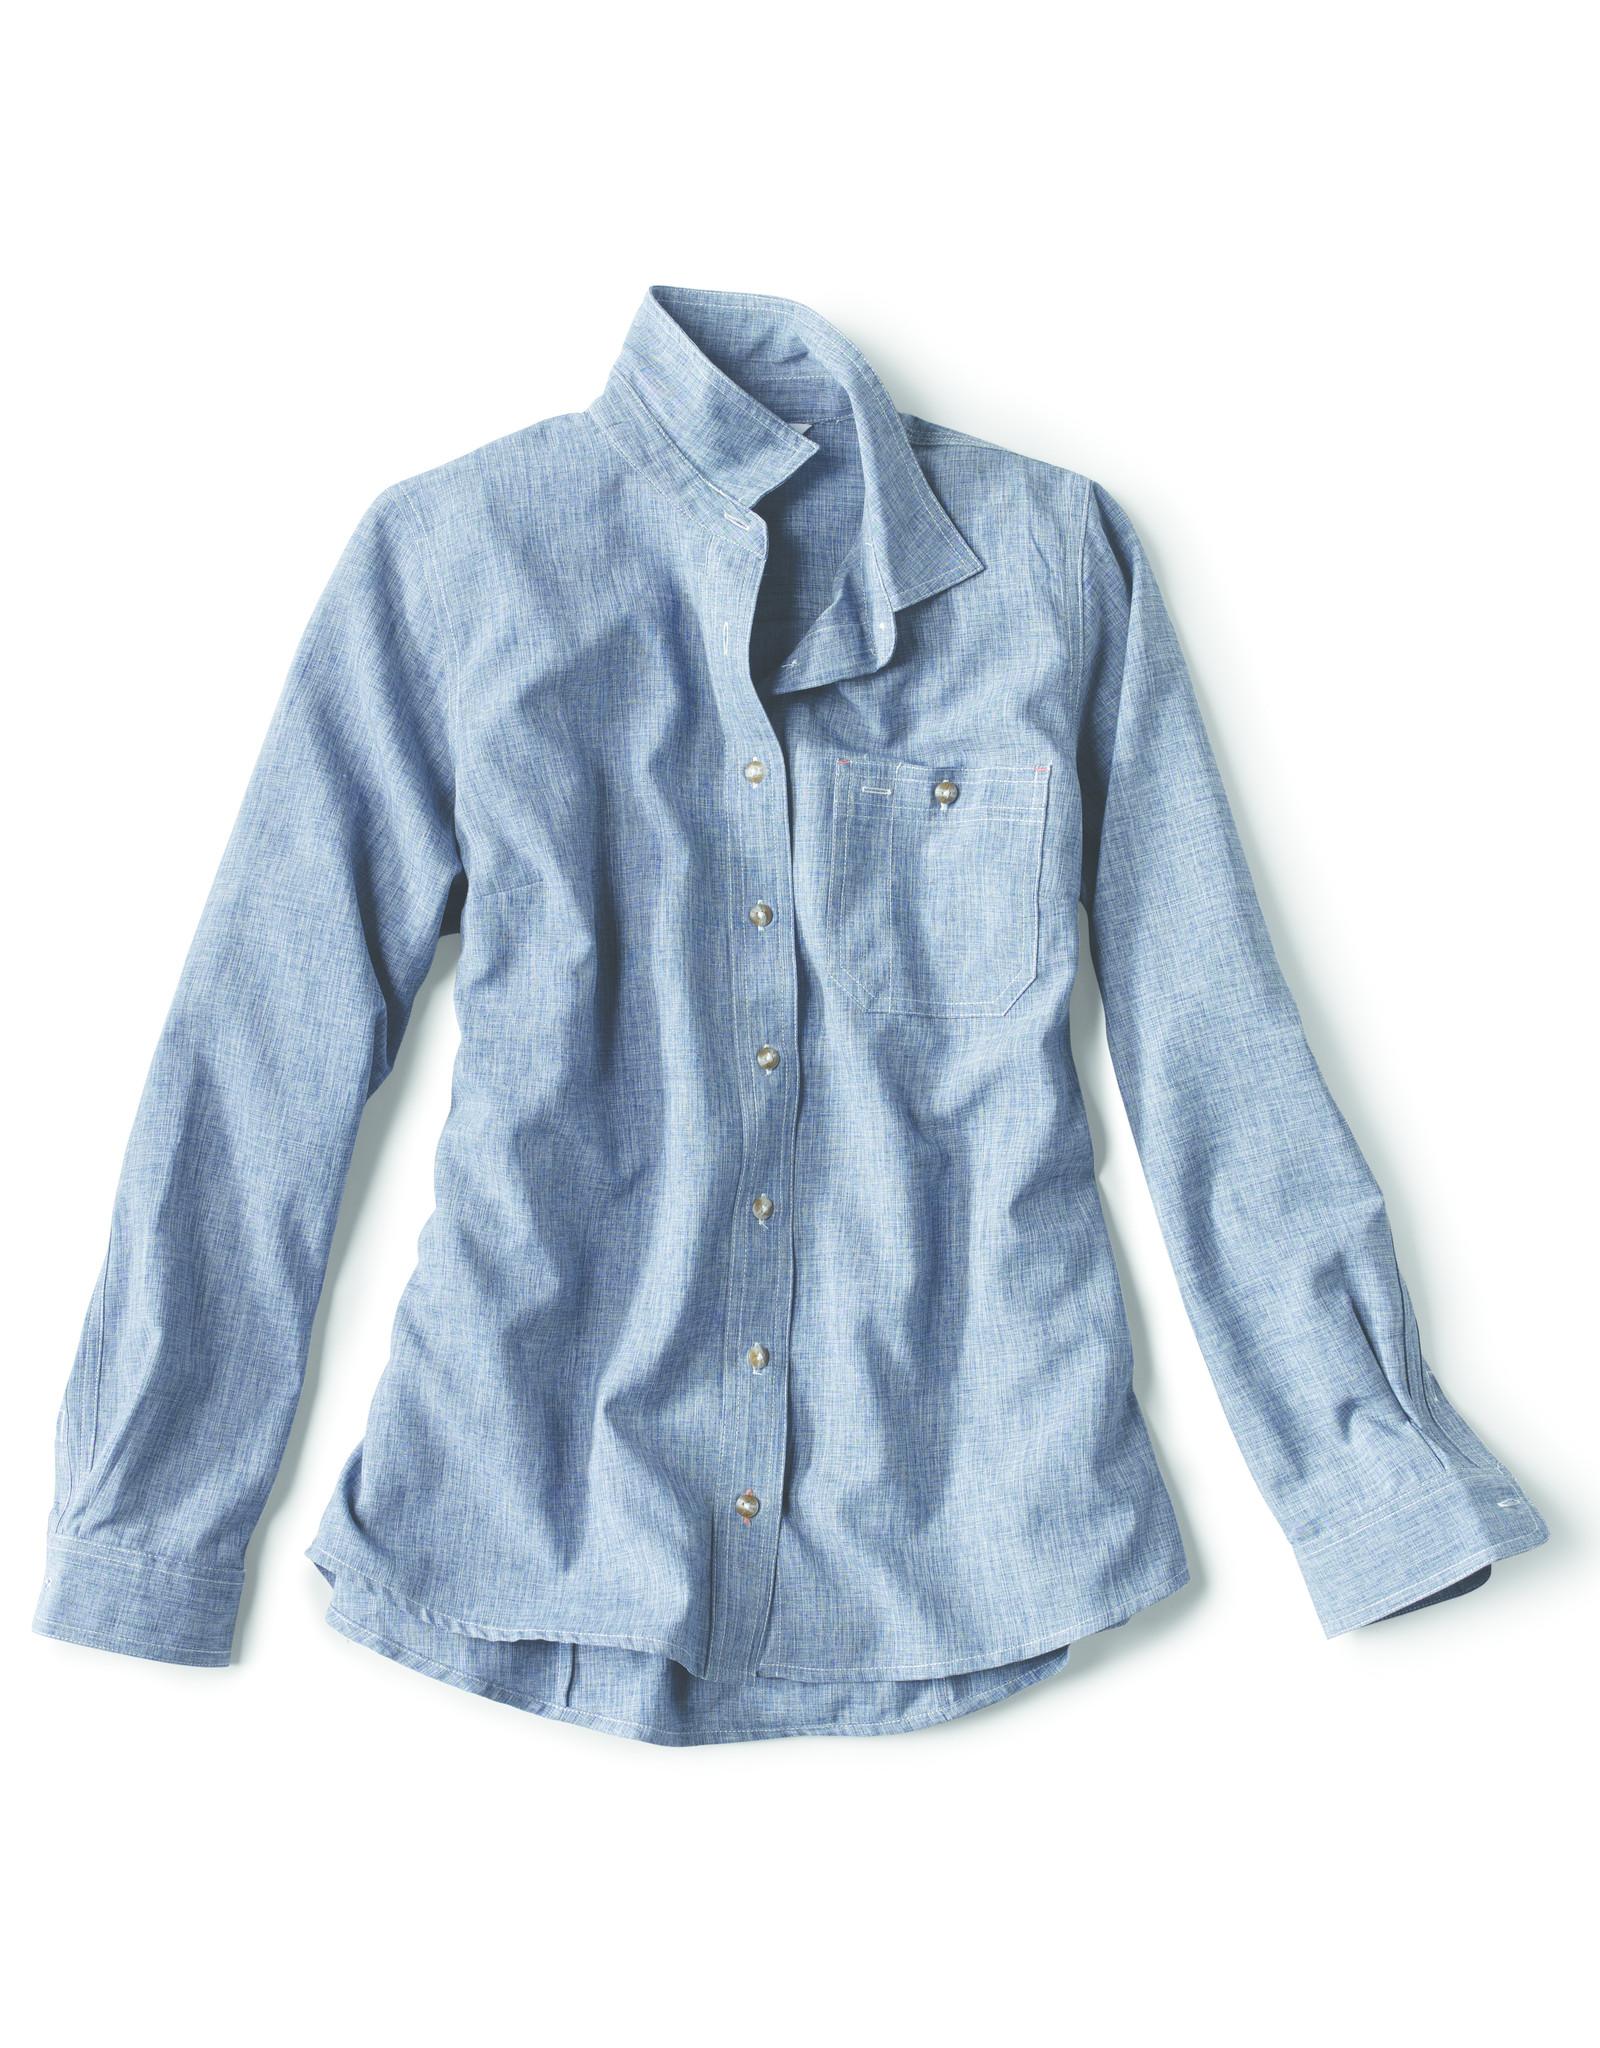 ORVIS Women's Tech Chambray Work Shirt